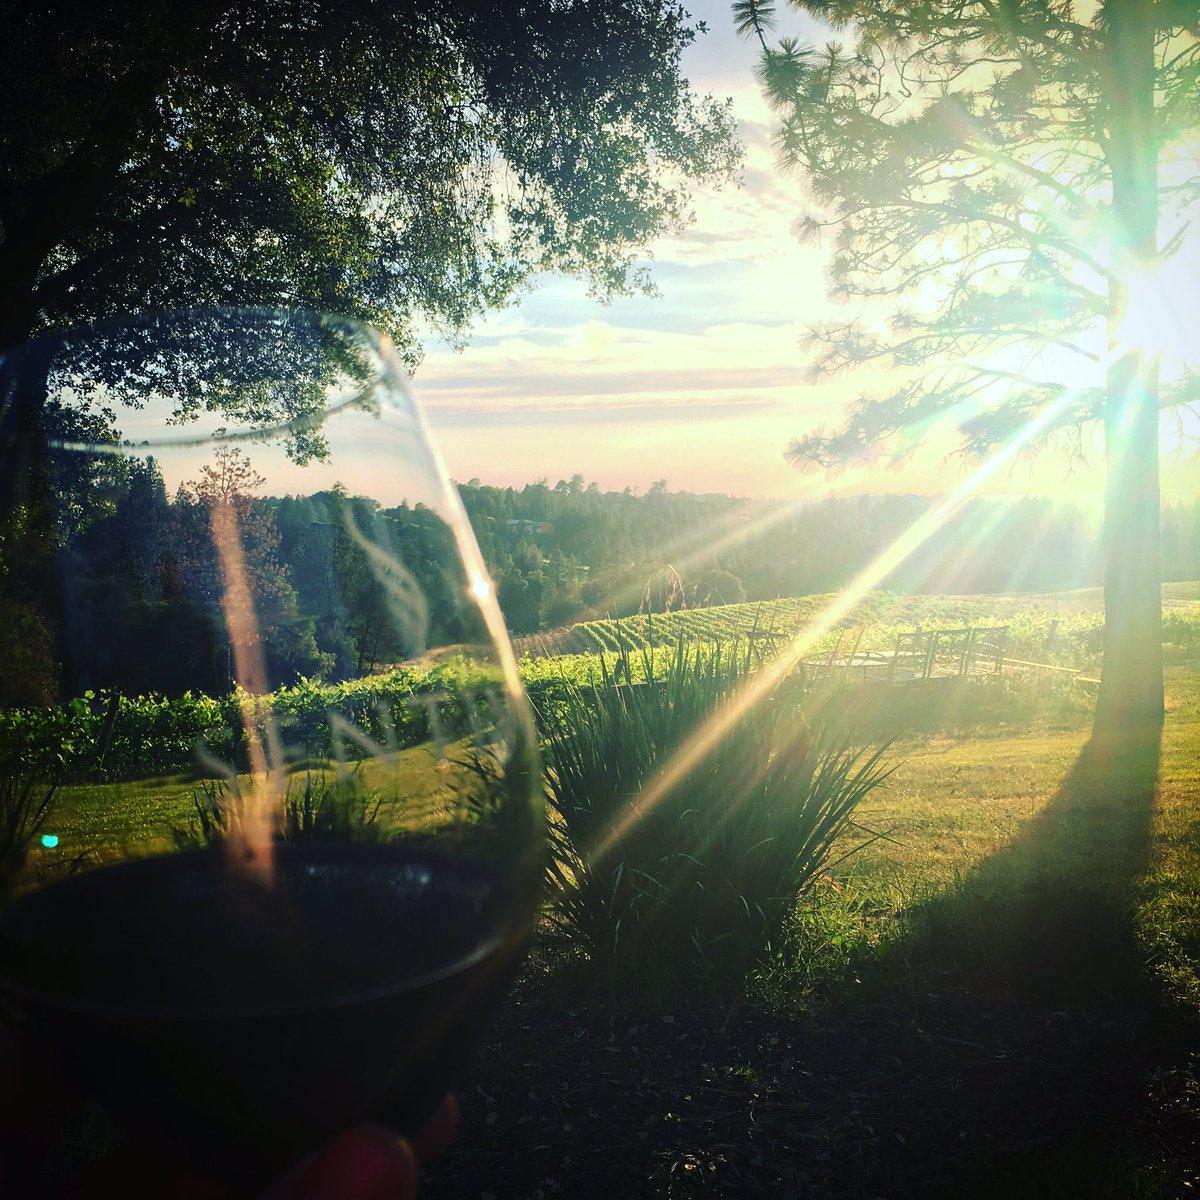 Sentivo winery